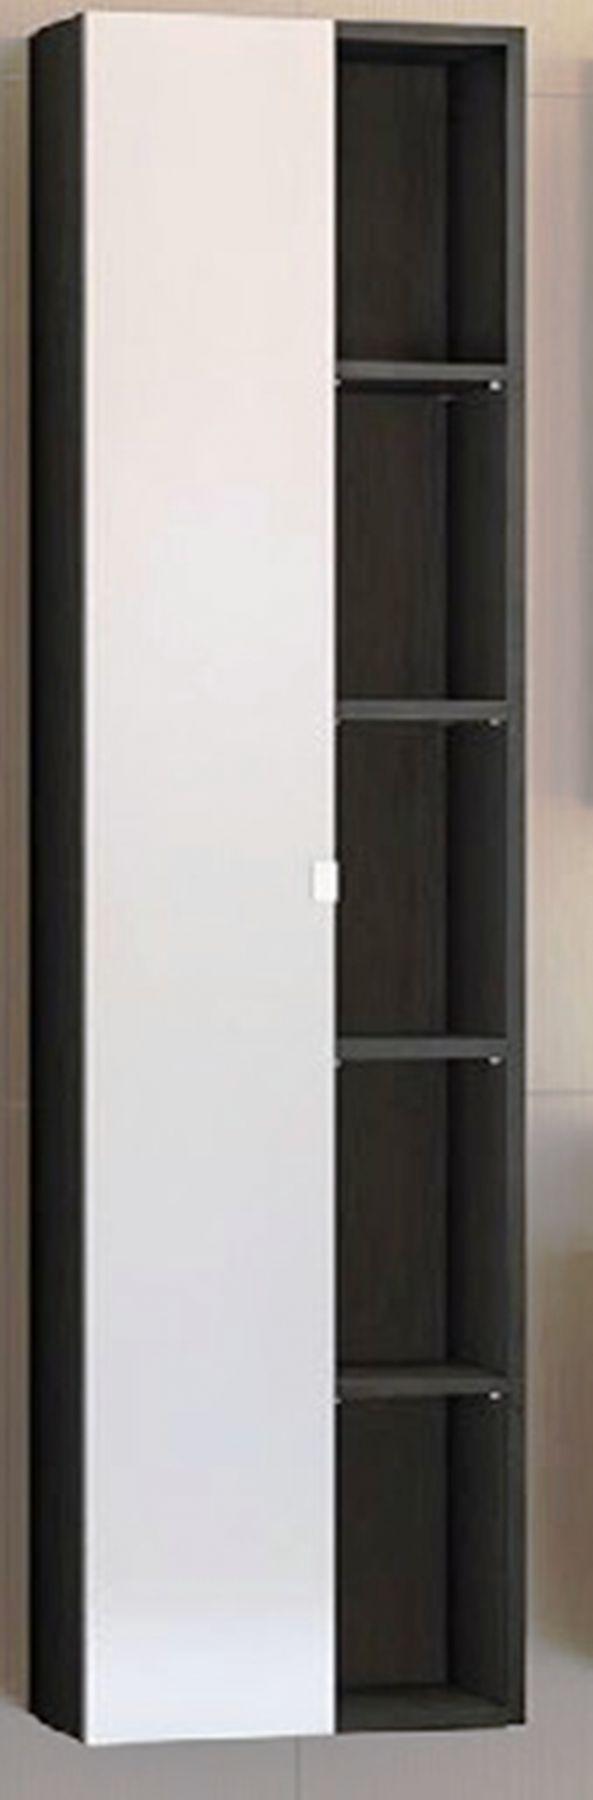 Зеркальный шкаф-пенал Balzo (Бальзо) 40х25 ФОТО